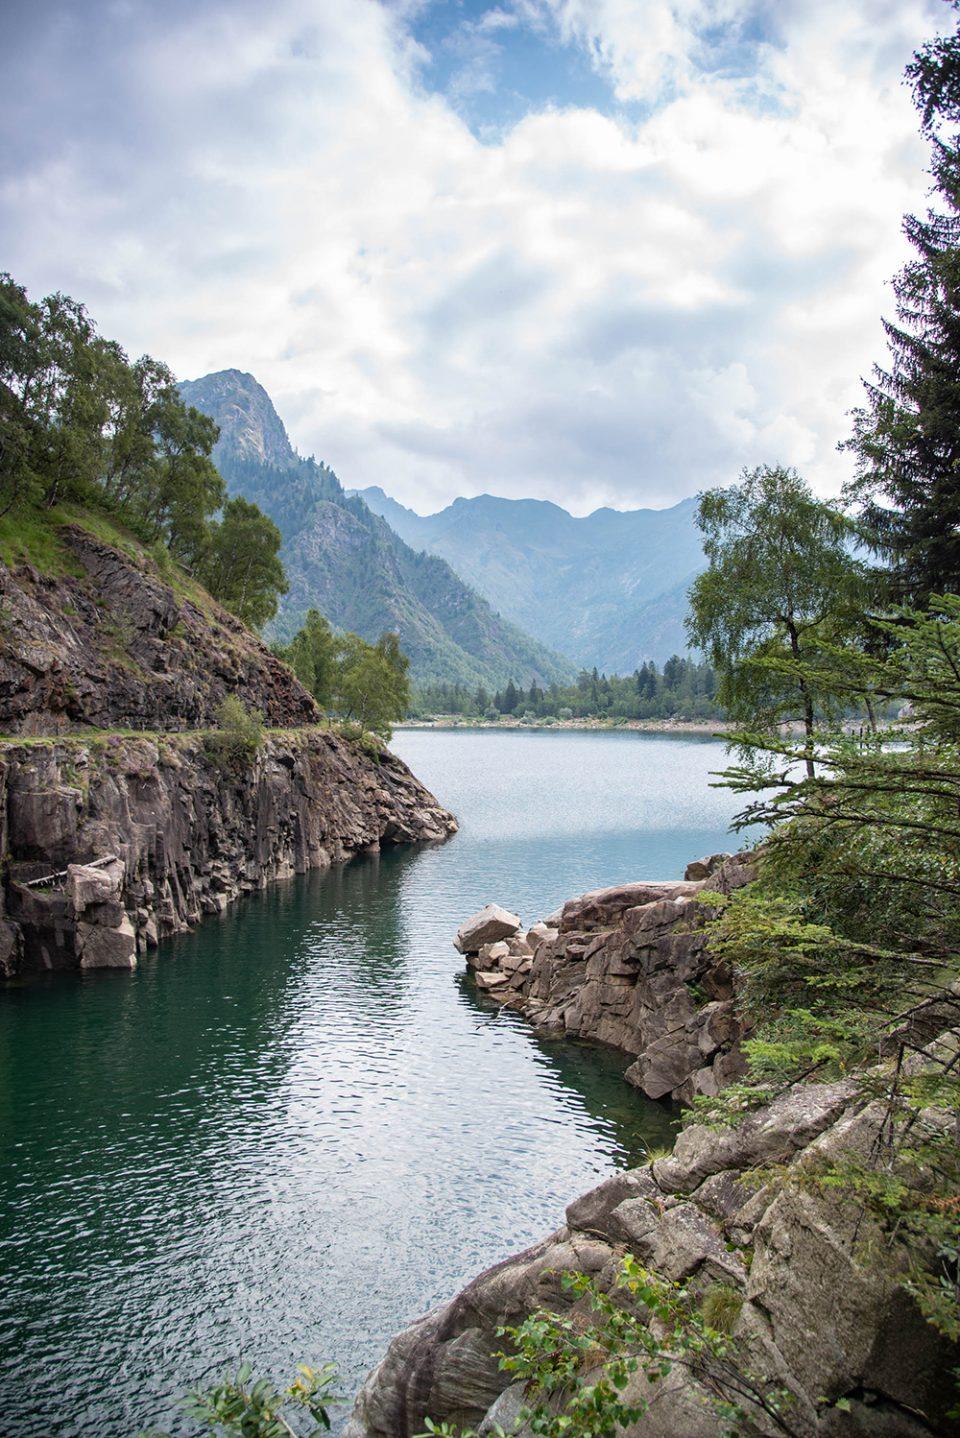 lago di antrona - valle antrona - scorcio lago di antrona